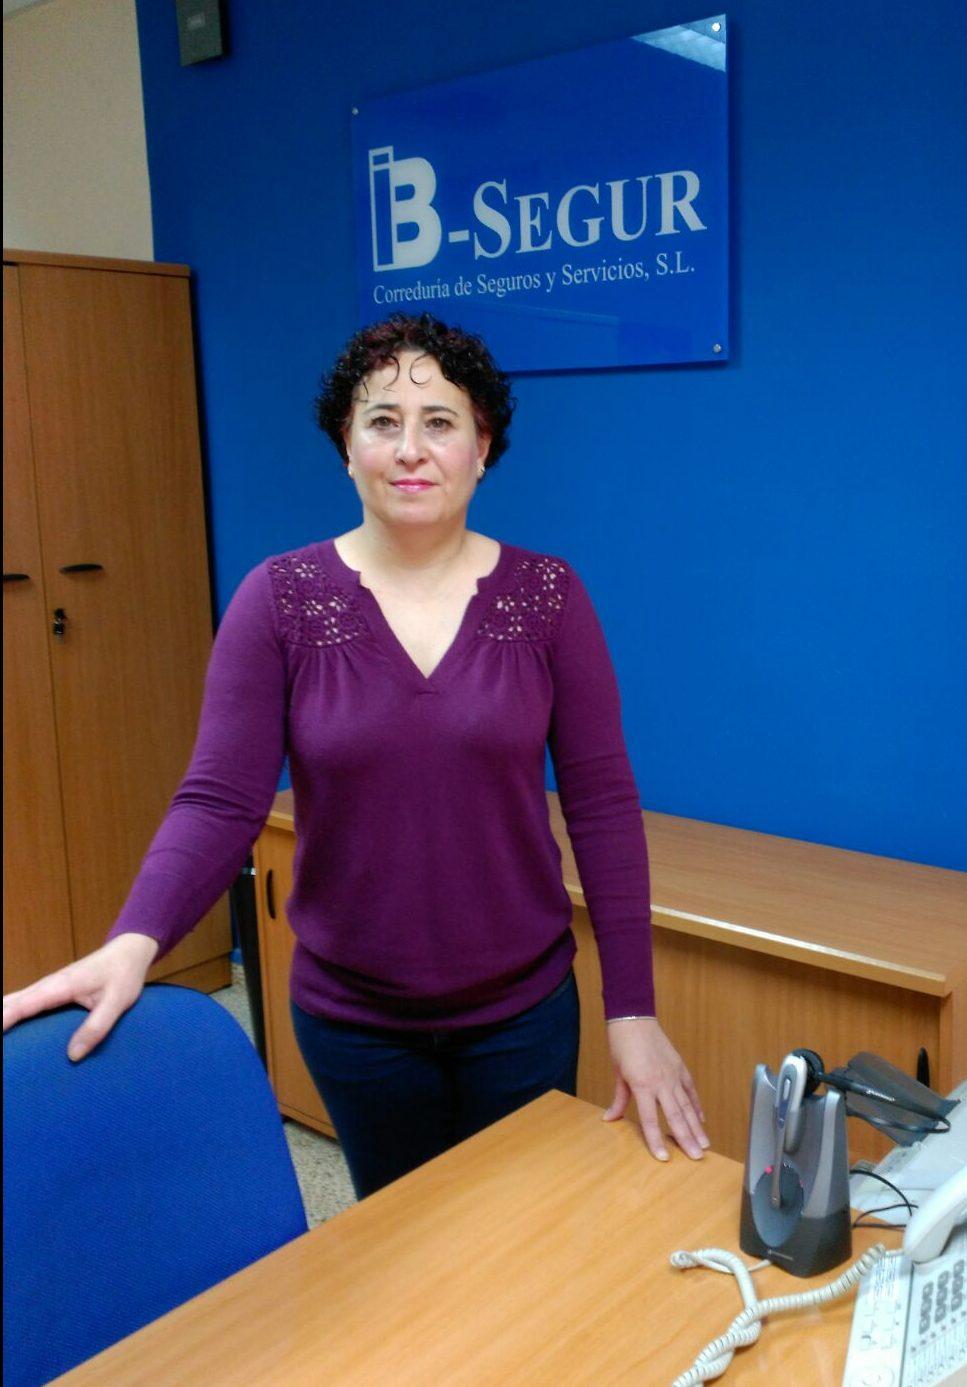 Correduria de Seguros IB-SEGUR 4